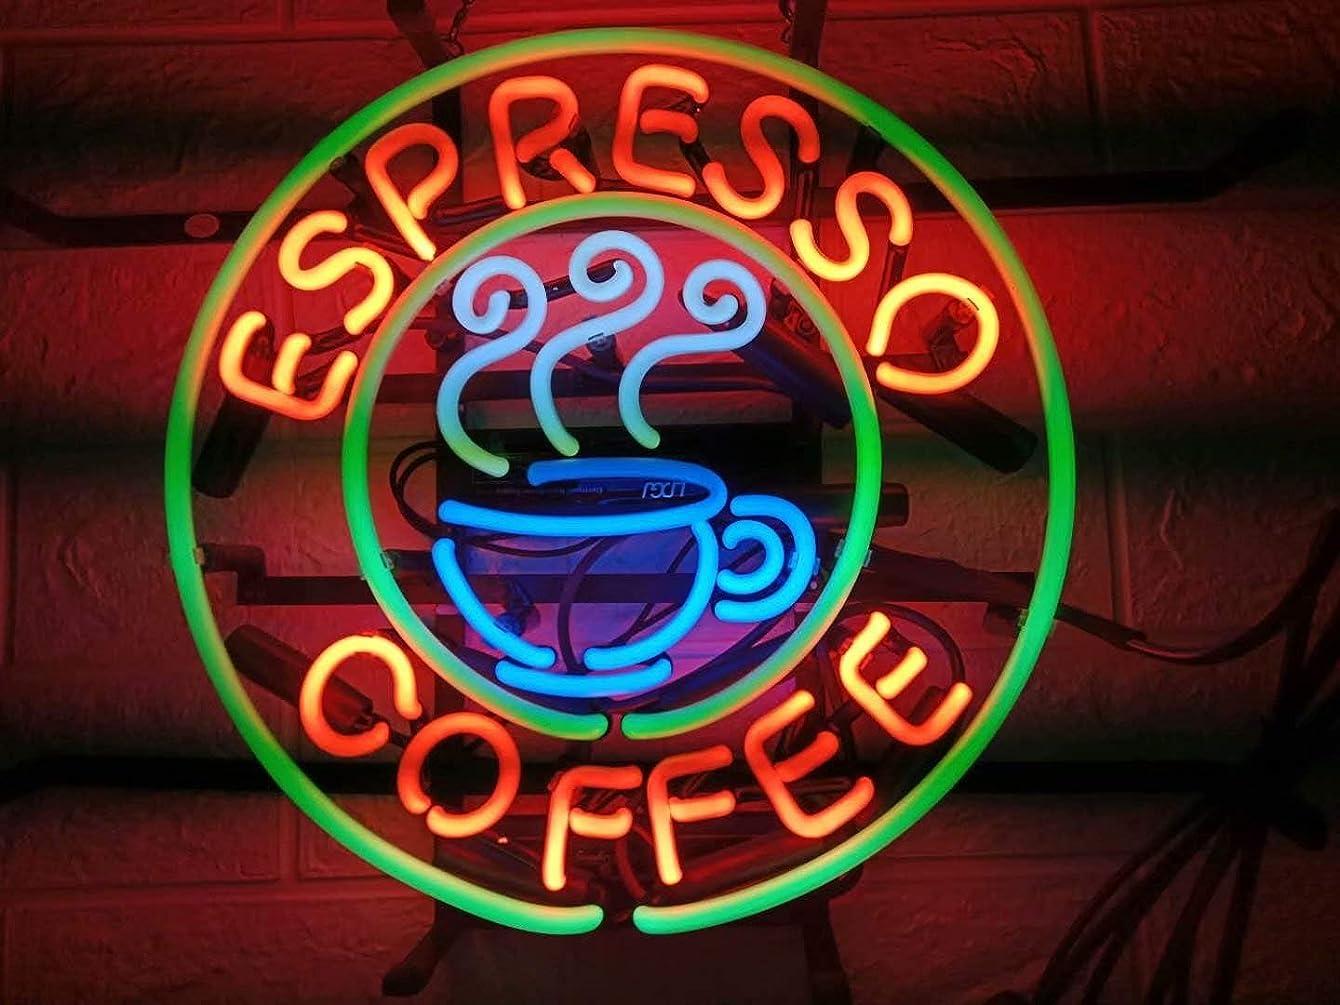 LDGJ Neon Signs for Wall Decor Handmade Sign Home Espresso Coffee Cafe Custom Beer Bar Pub Recreation Room Lights Windows Glass Party